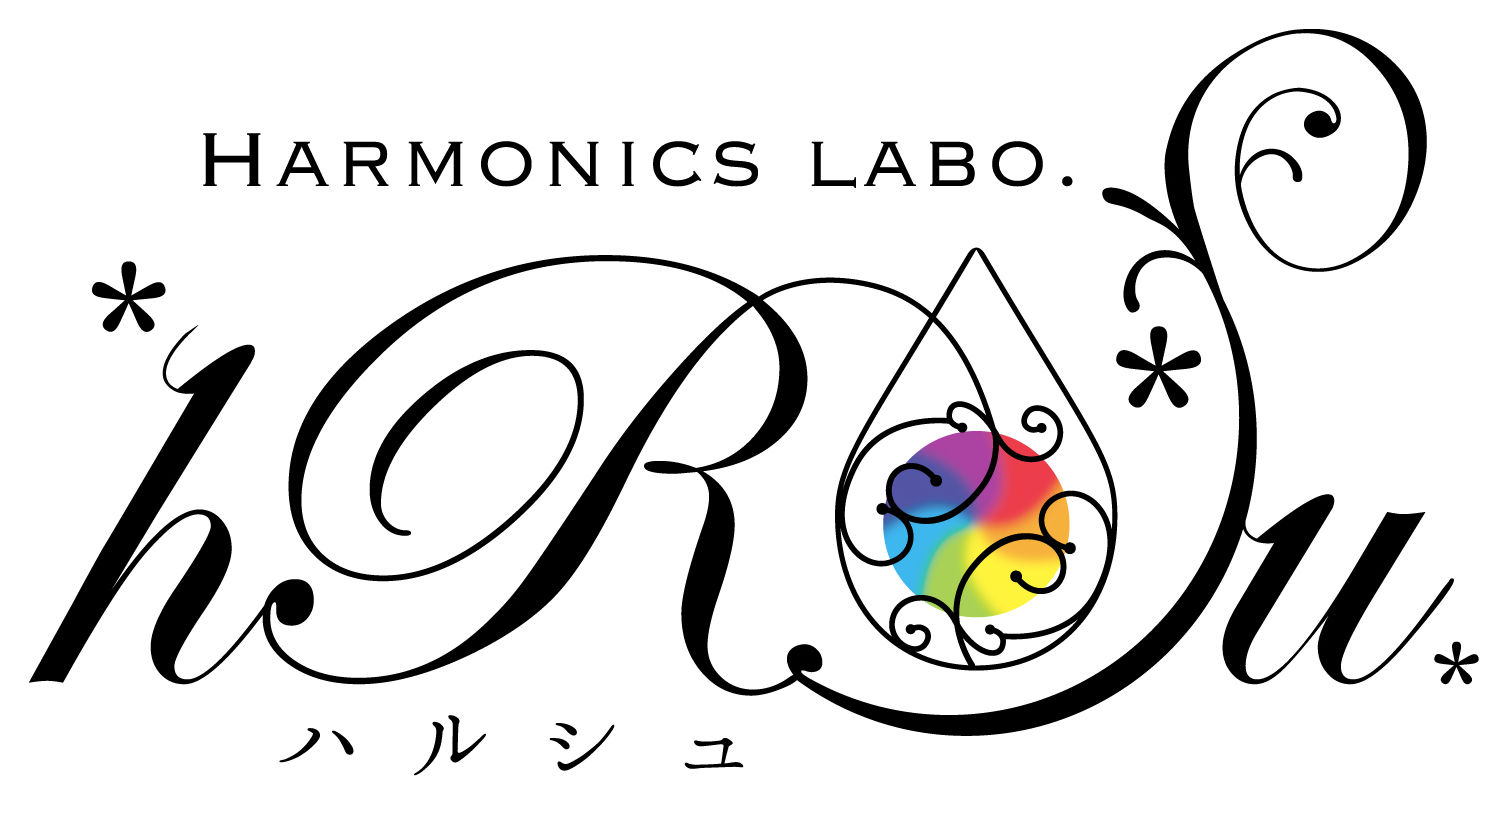 HARMONICS LABO. hRSu*別館STORES